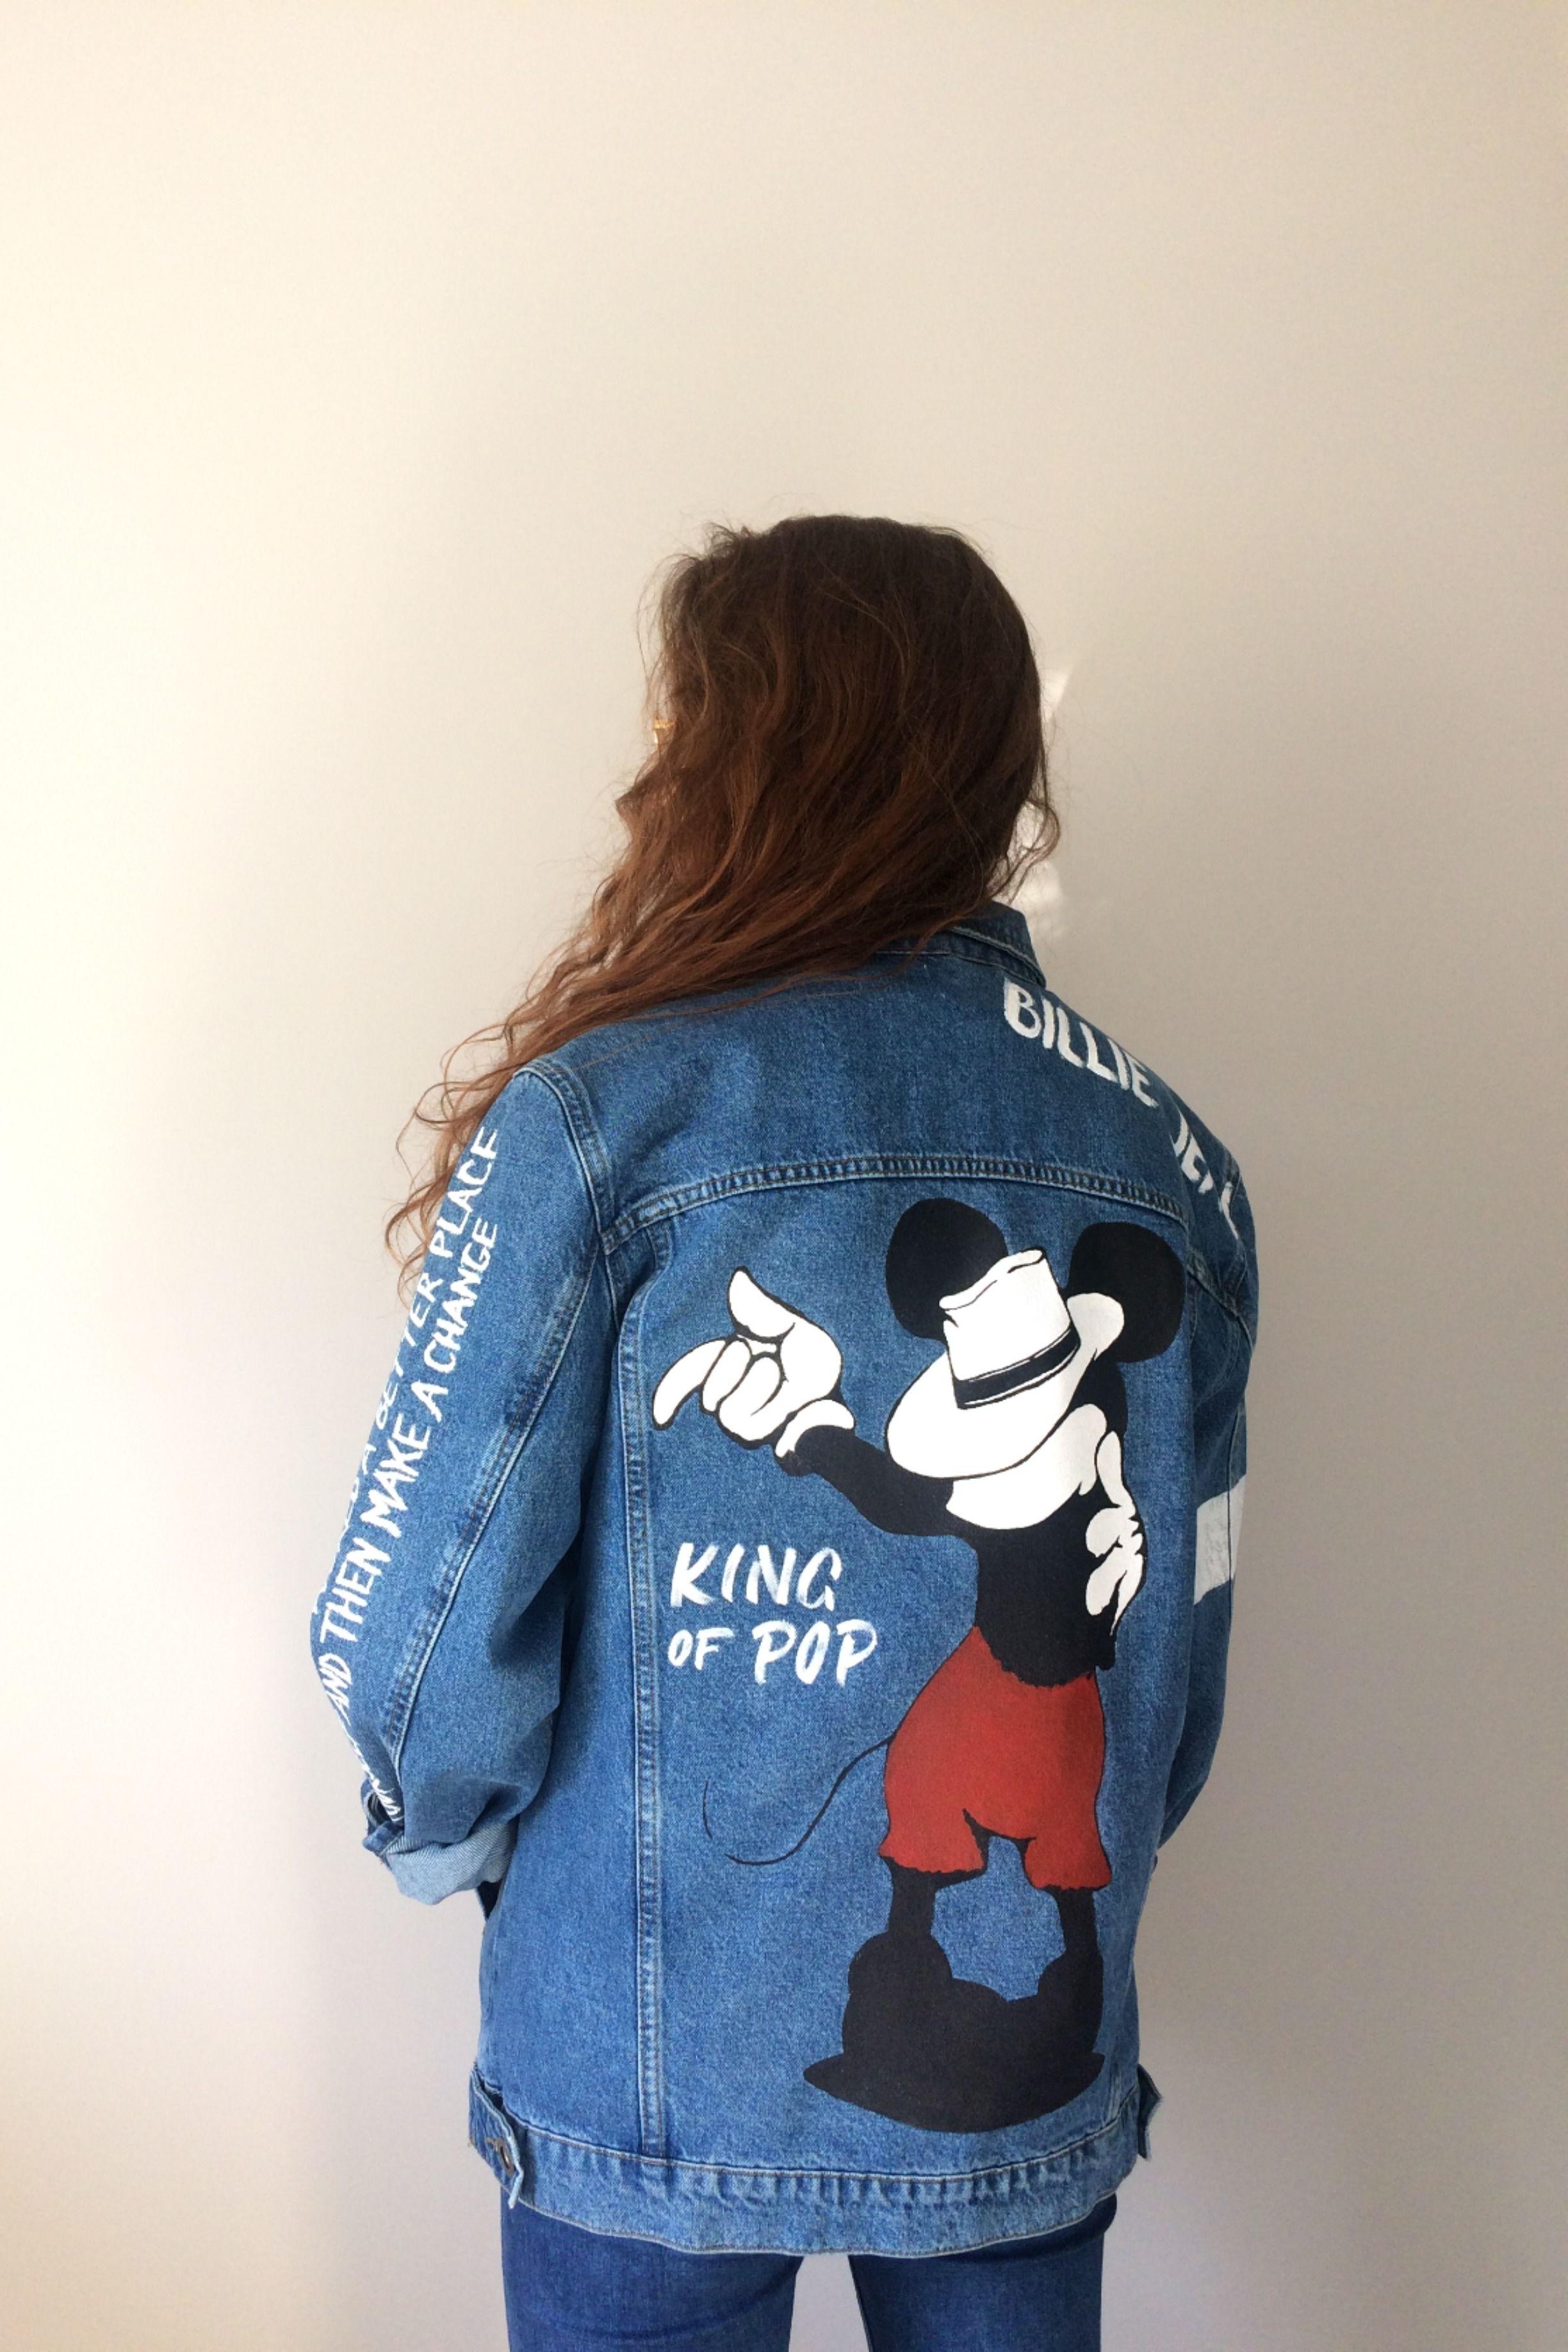 Custom Denim Jacket Michael Jackson Custom Clothes Clothes Outfit Accessories [ 3672 x 2448 Pixel ]